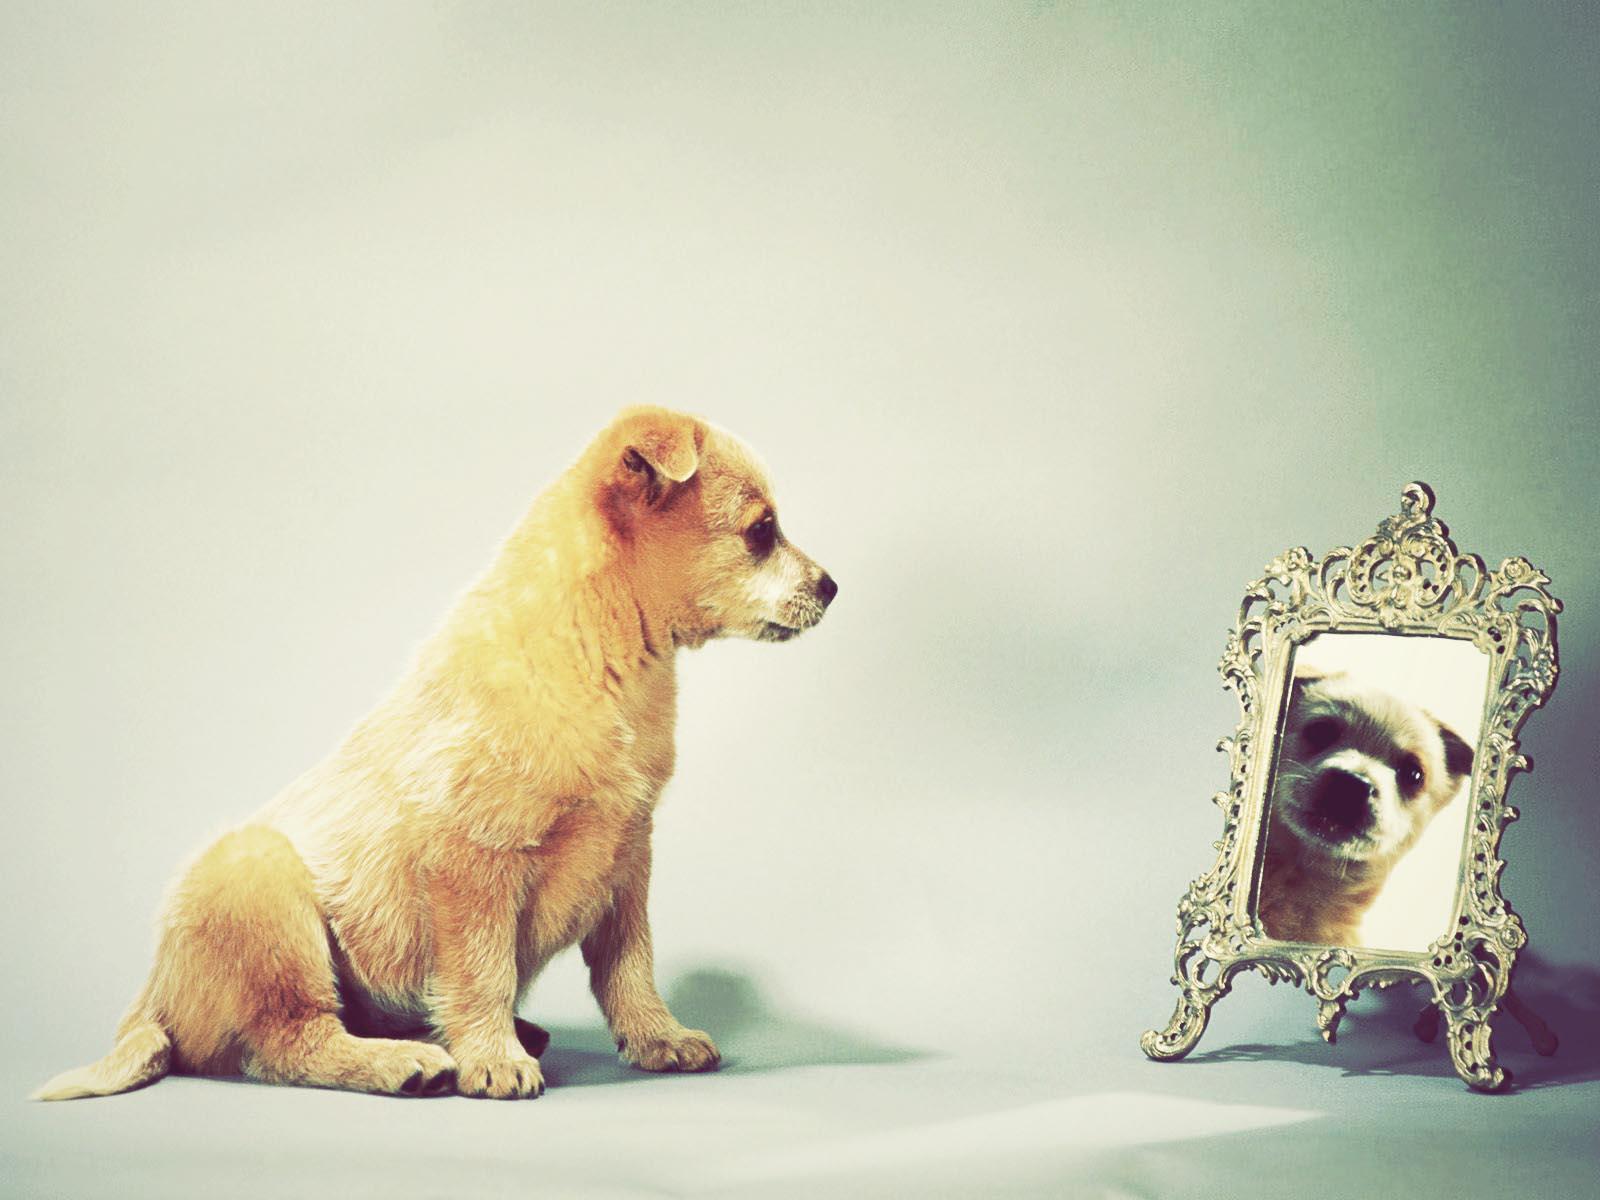 cachorro_australiano_olhando_no_espelho